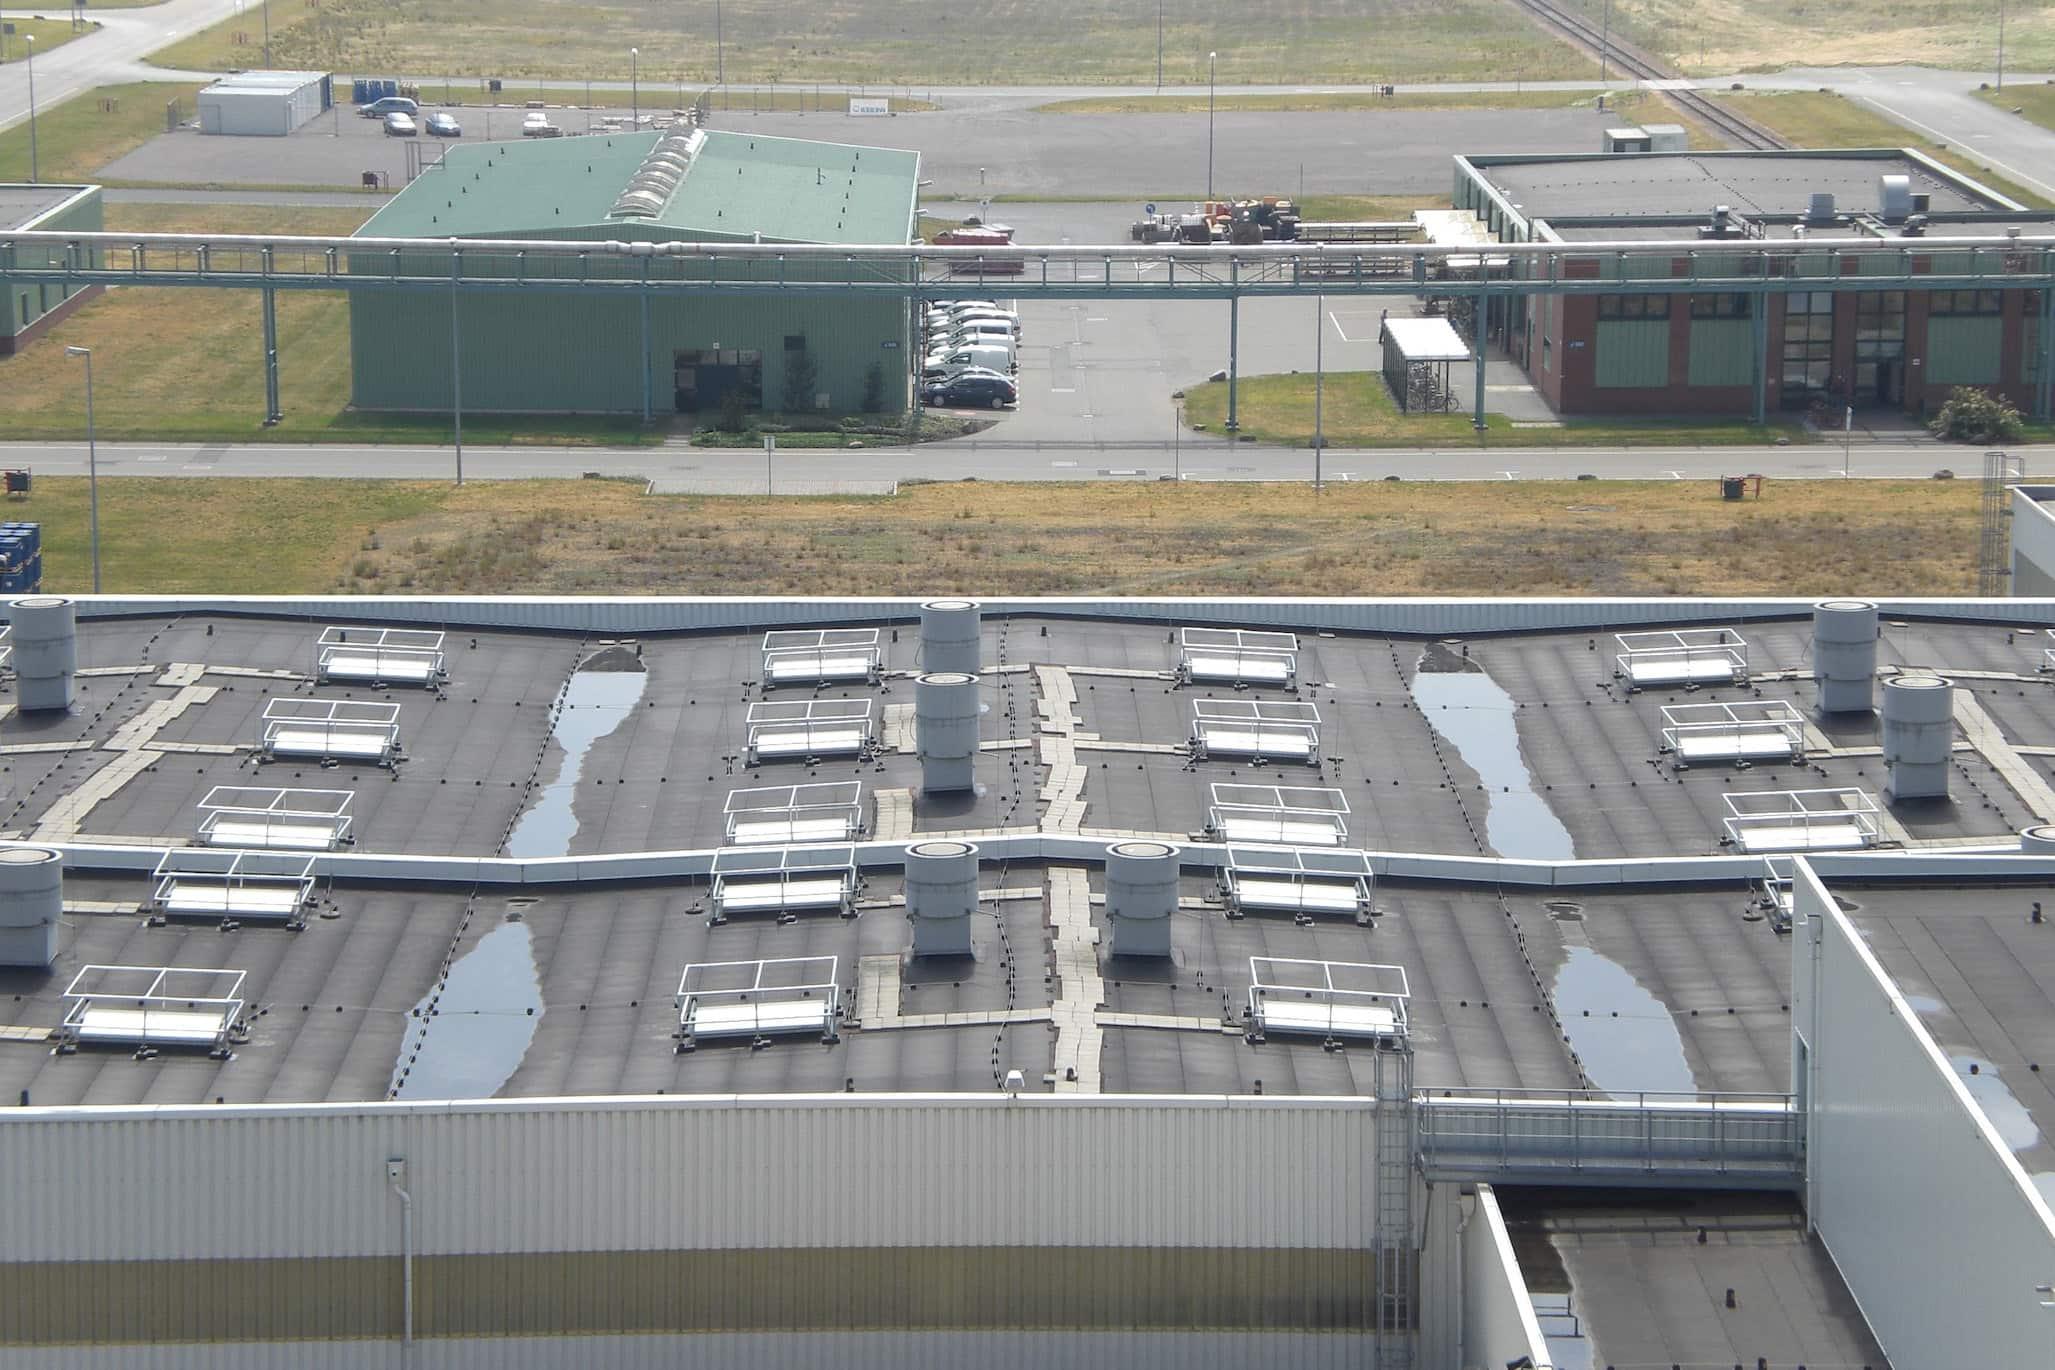 Kee Dome, skylight guardrail